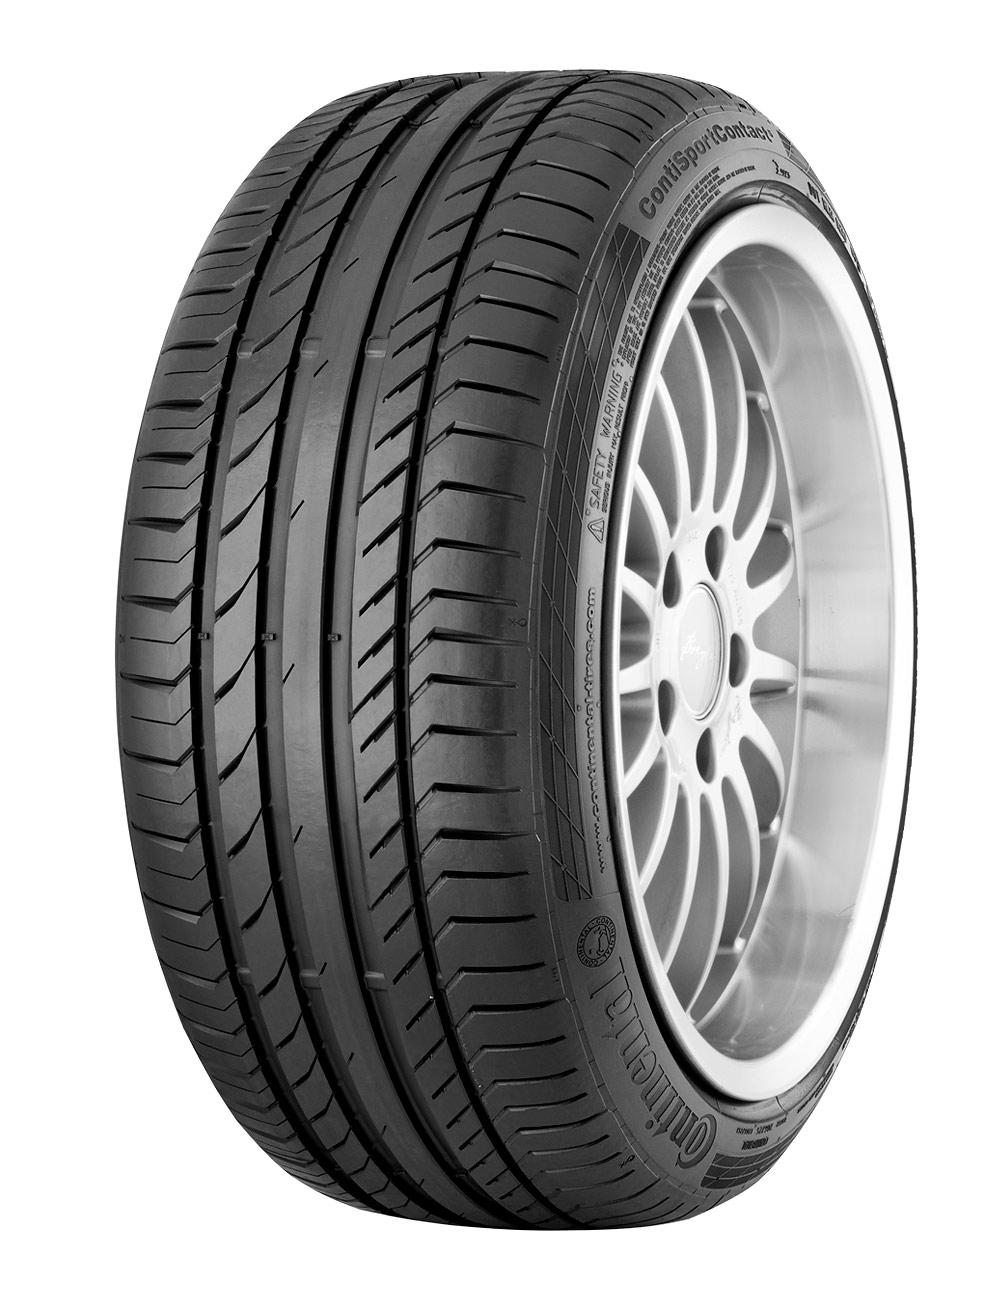 CONTINENTAL conti sport contact 5 275/40 R19 101Y TL FR, letní pneu, osobní a SUV